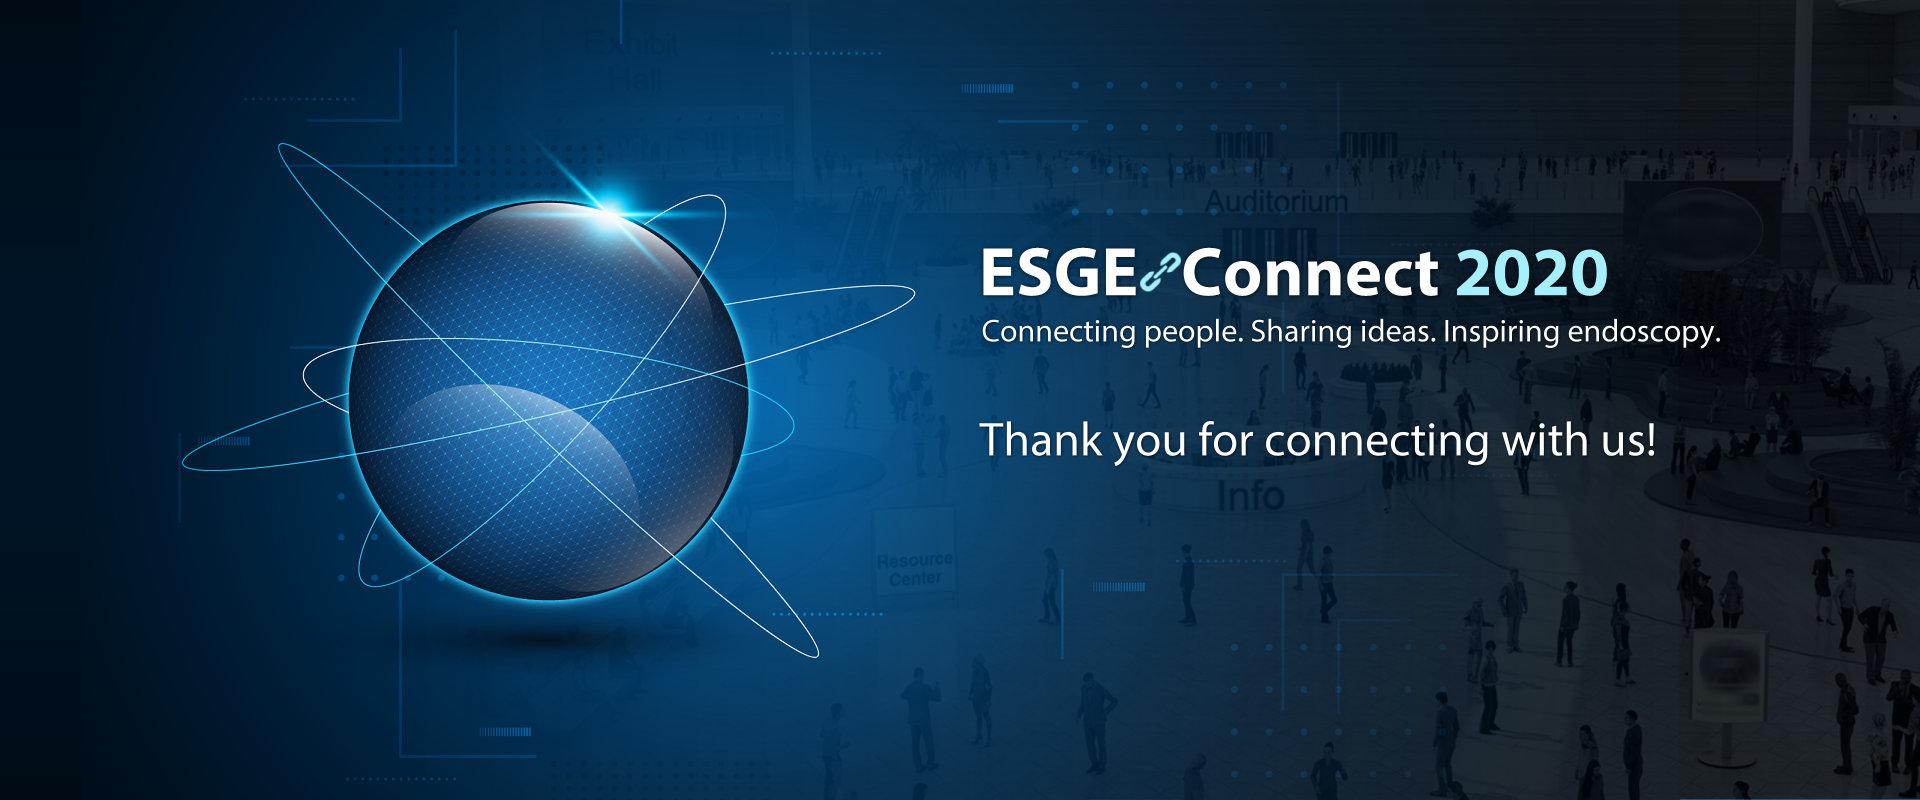 ESGE_connect_web_banner_1920x800_post_1